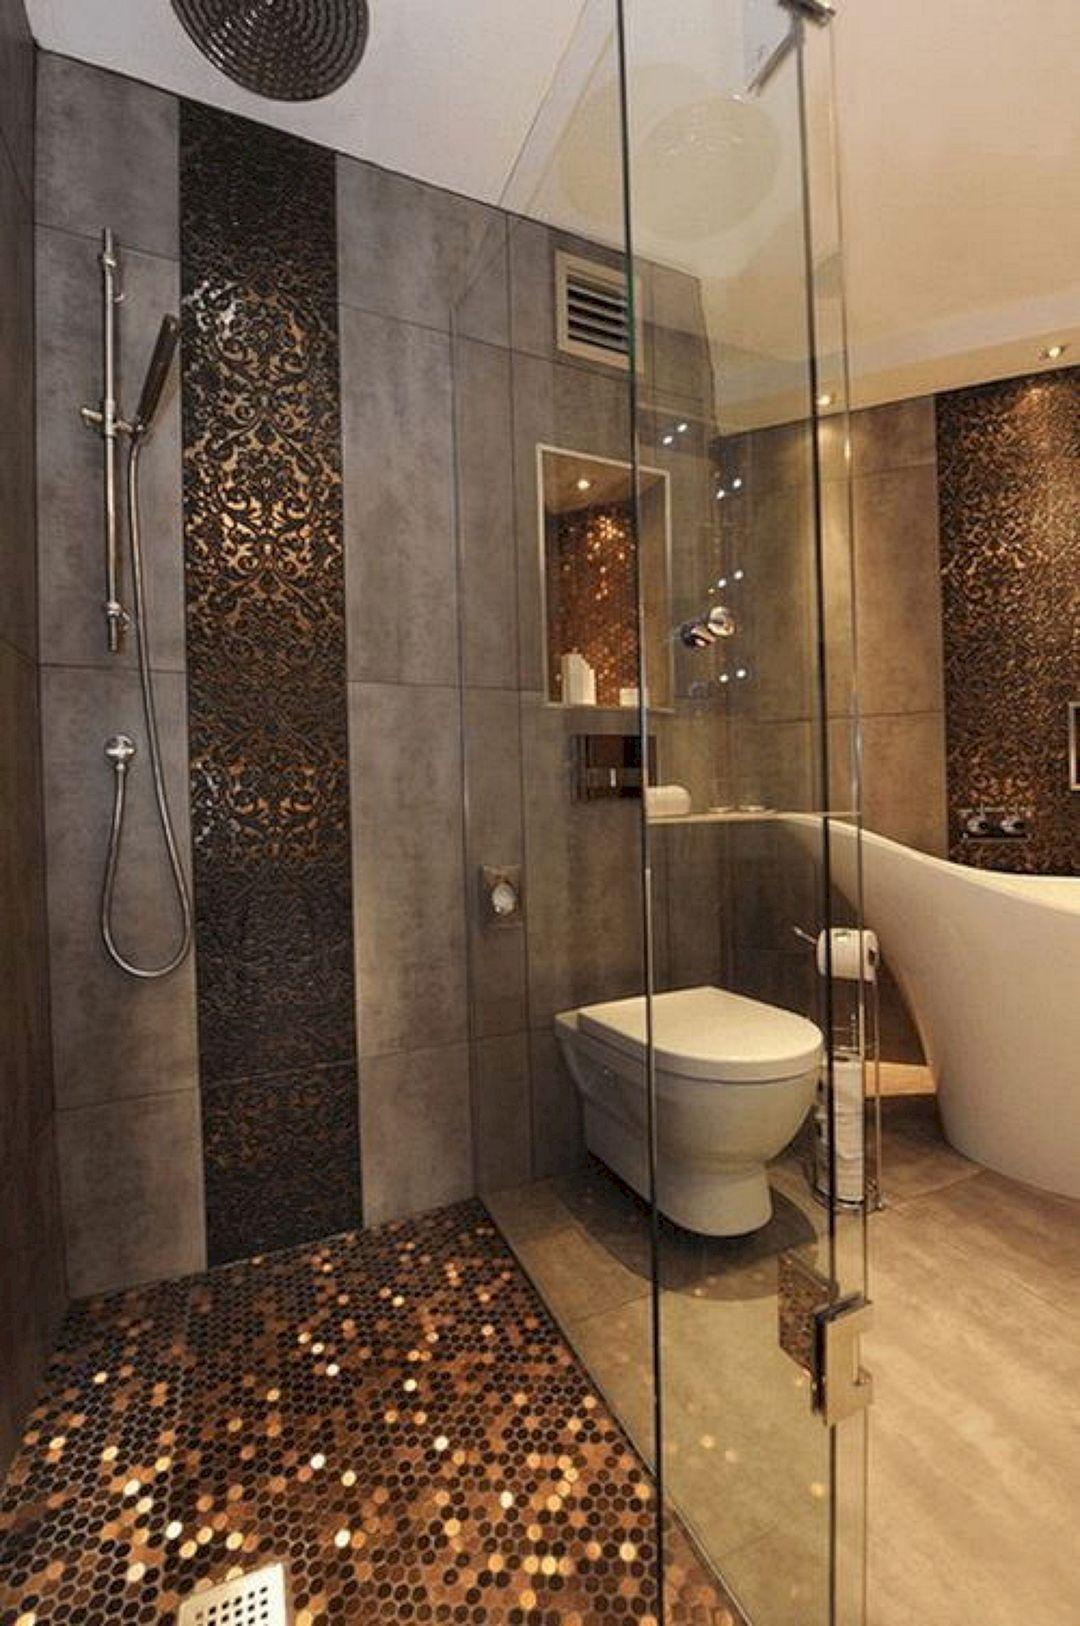 Top 65 Stunning Modern Bathroom Shower Design Ideas Bathroom Shower Design Modern Bathroom Decor Mosaic Bathroom Tile